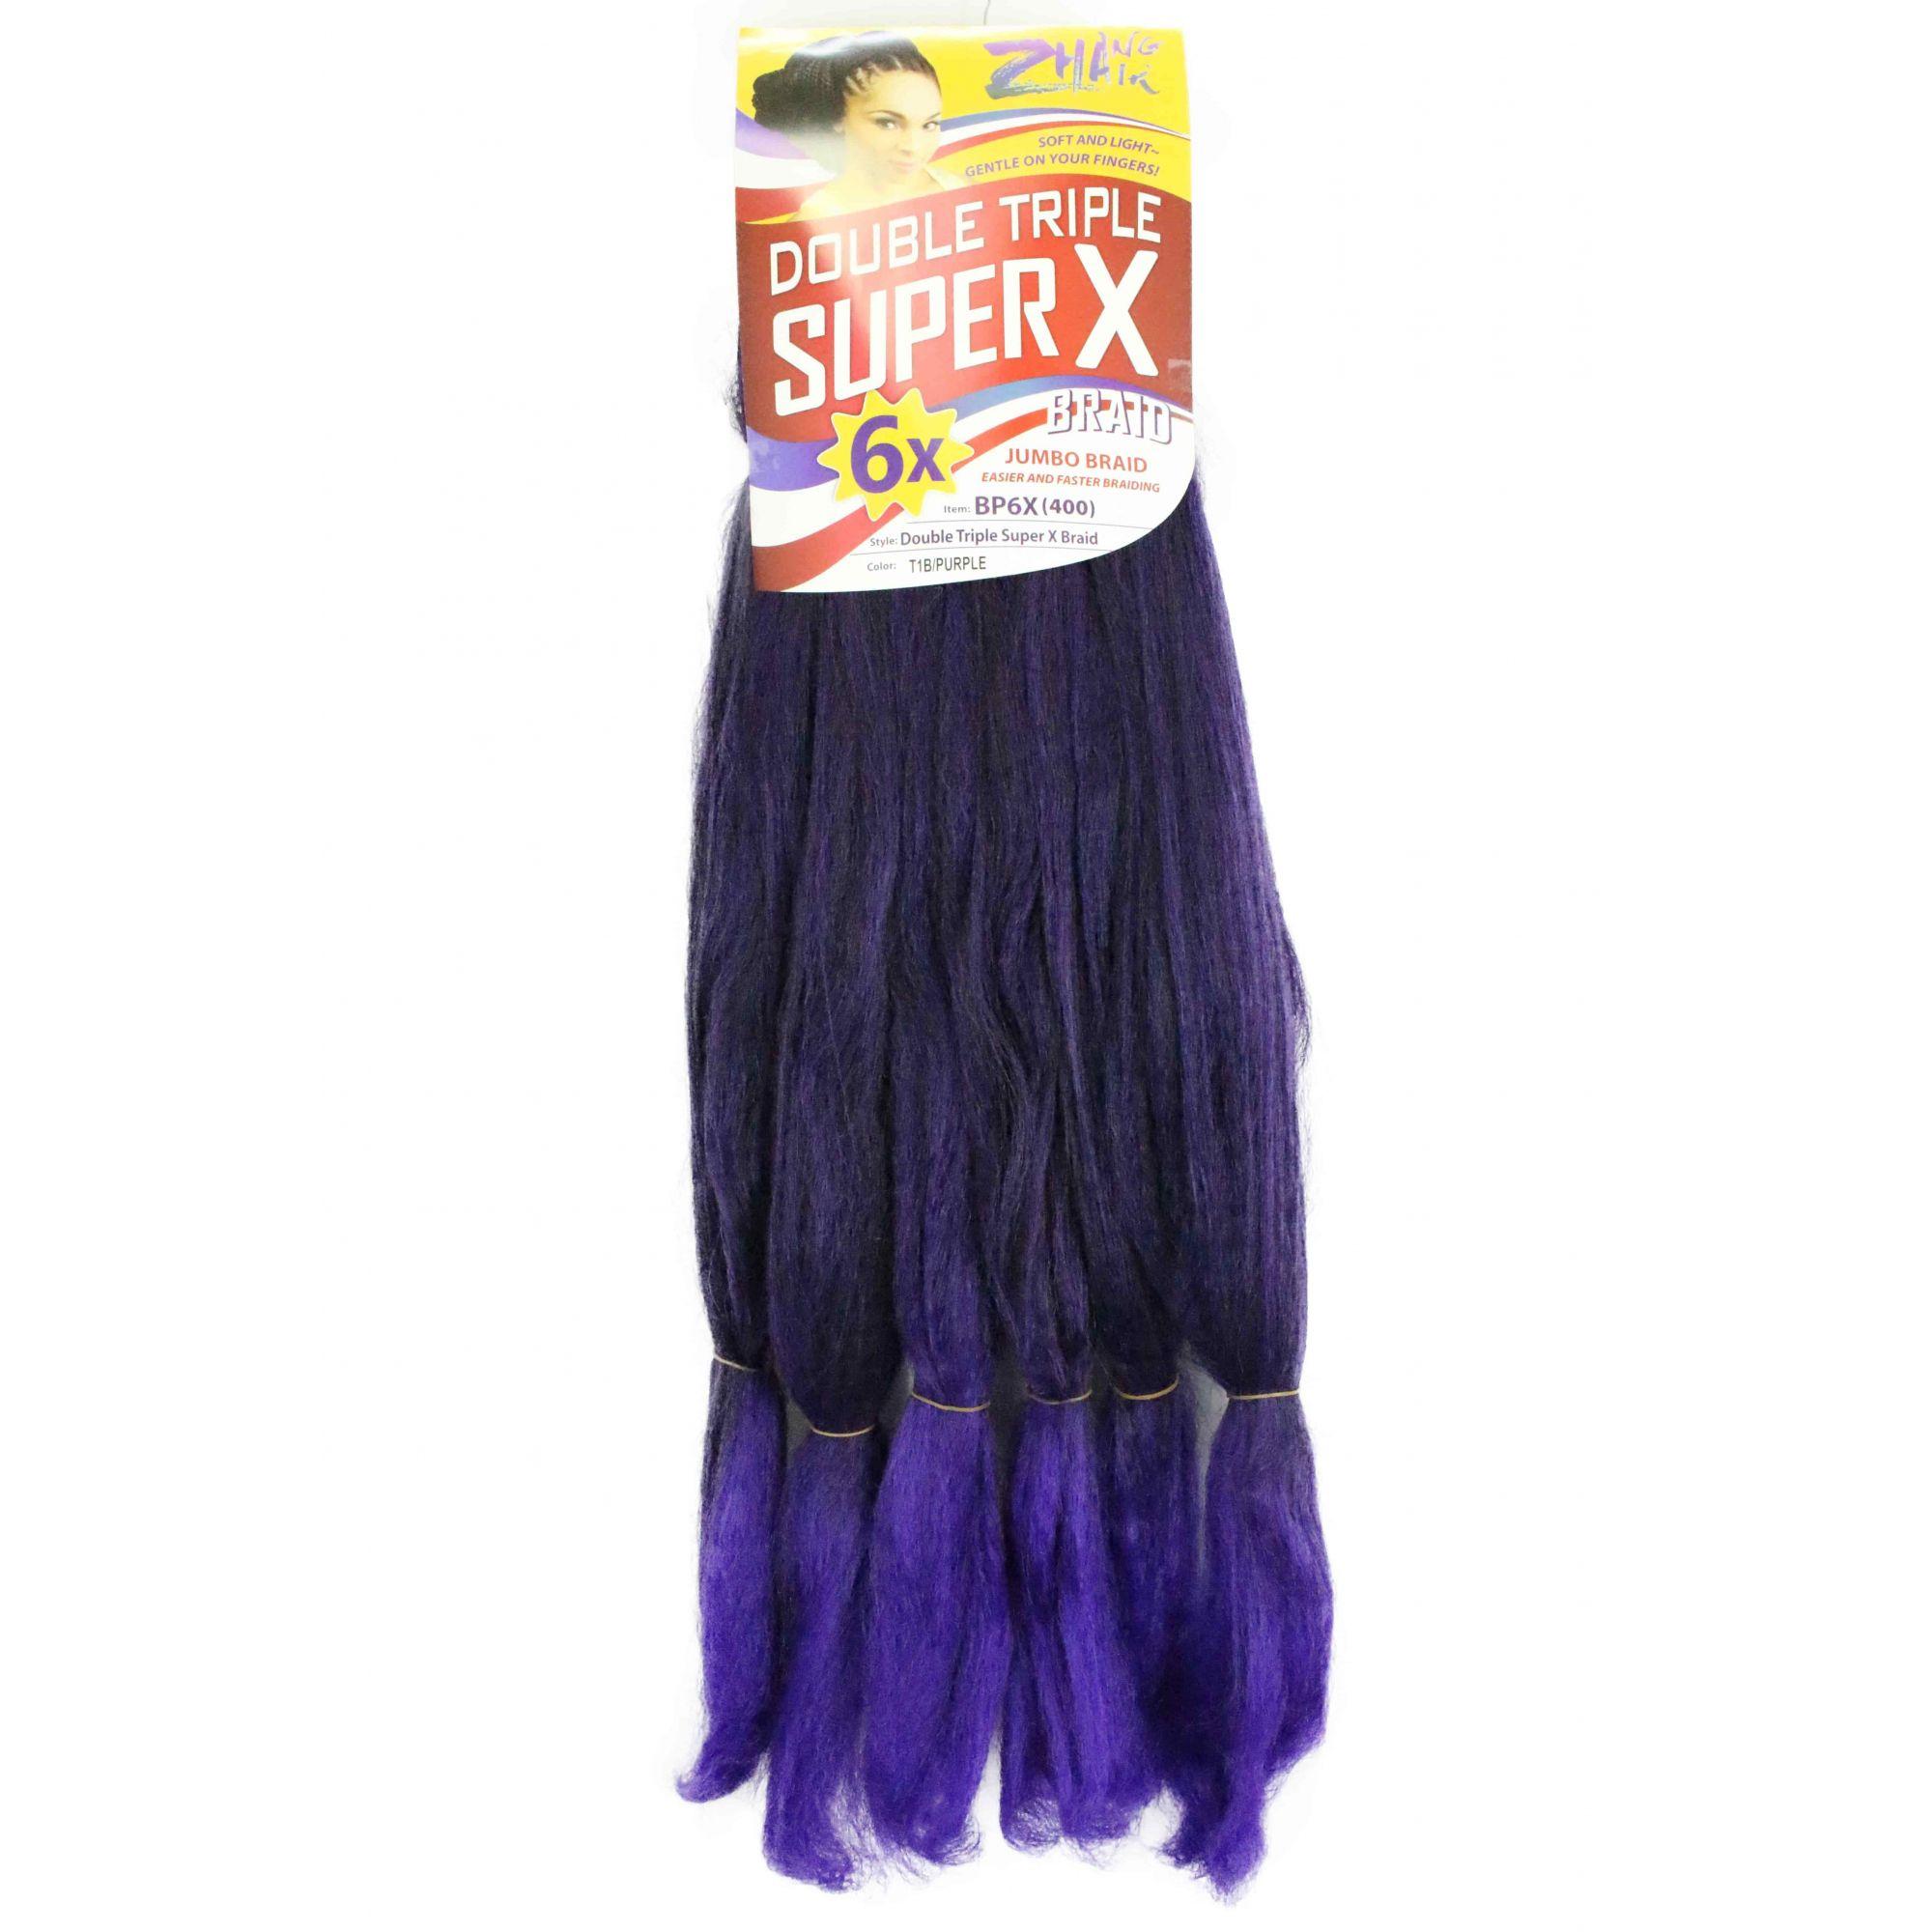 Cabelo Sintético - Zhang hair jumbo - Super X (400g) - Cor: Preto com Roxo (T1B/Purple)